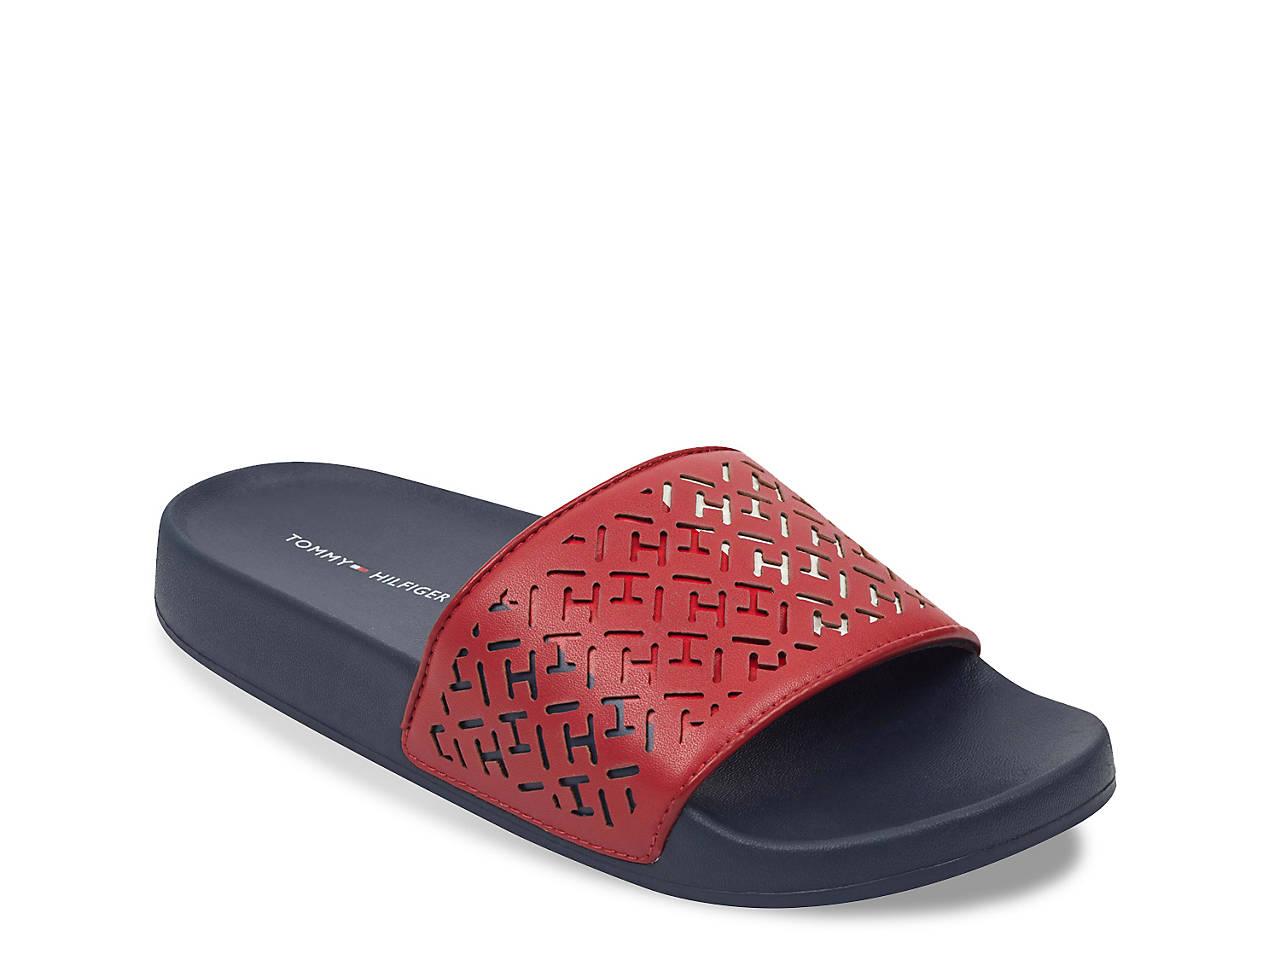 a15801b5b29add Tommy Hilfiger Dillon Sandal Women s Shoes